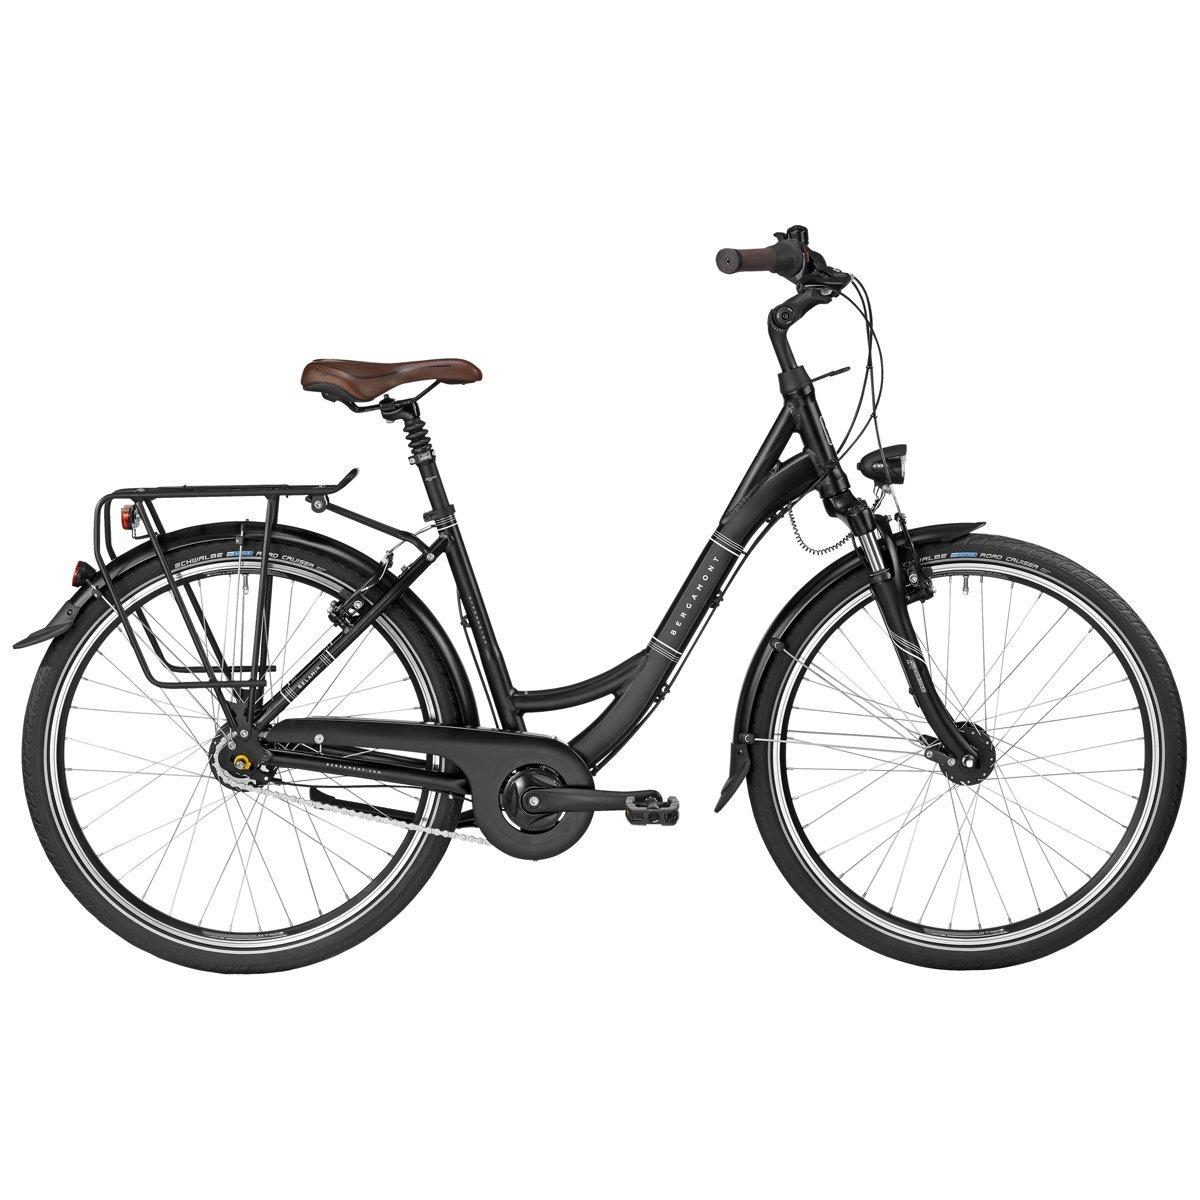 Citybike test